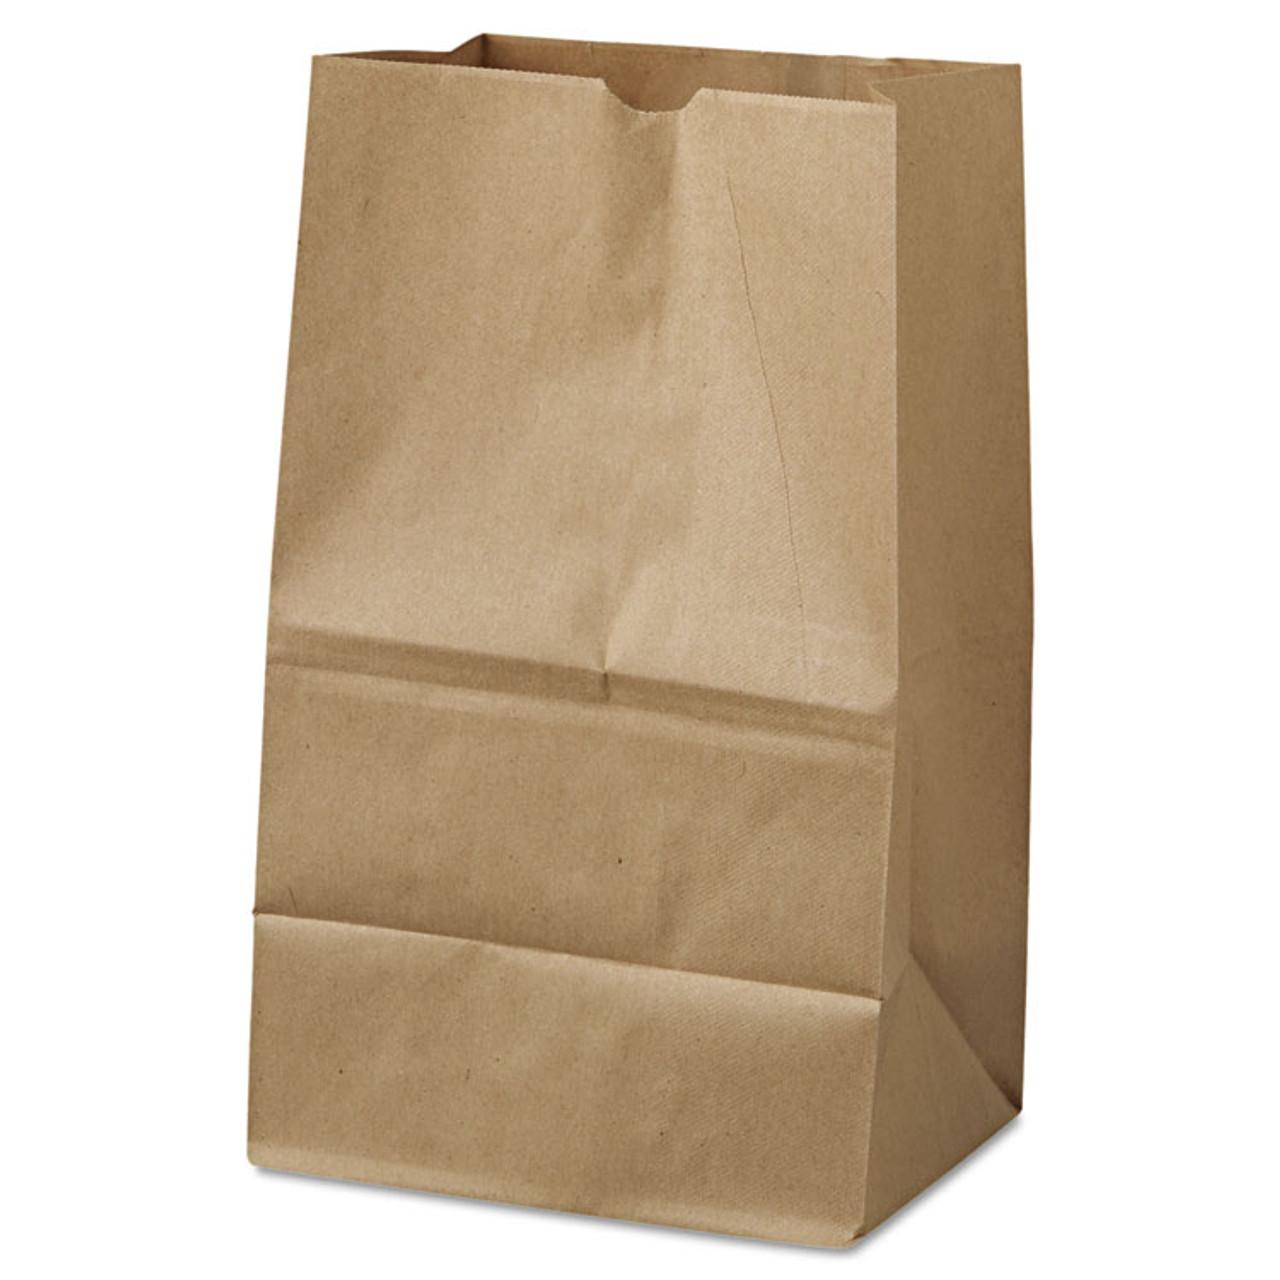 "Kraft Paper Bags #20 - 8.25"" x 5.25"" x 16.125"" - Case of 500"